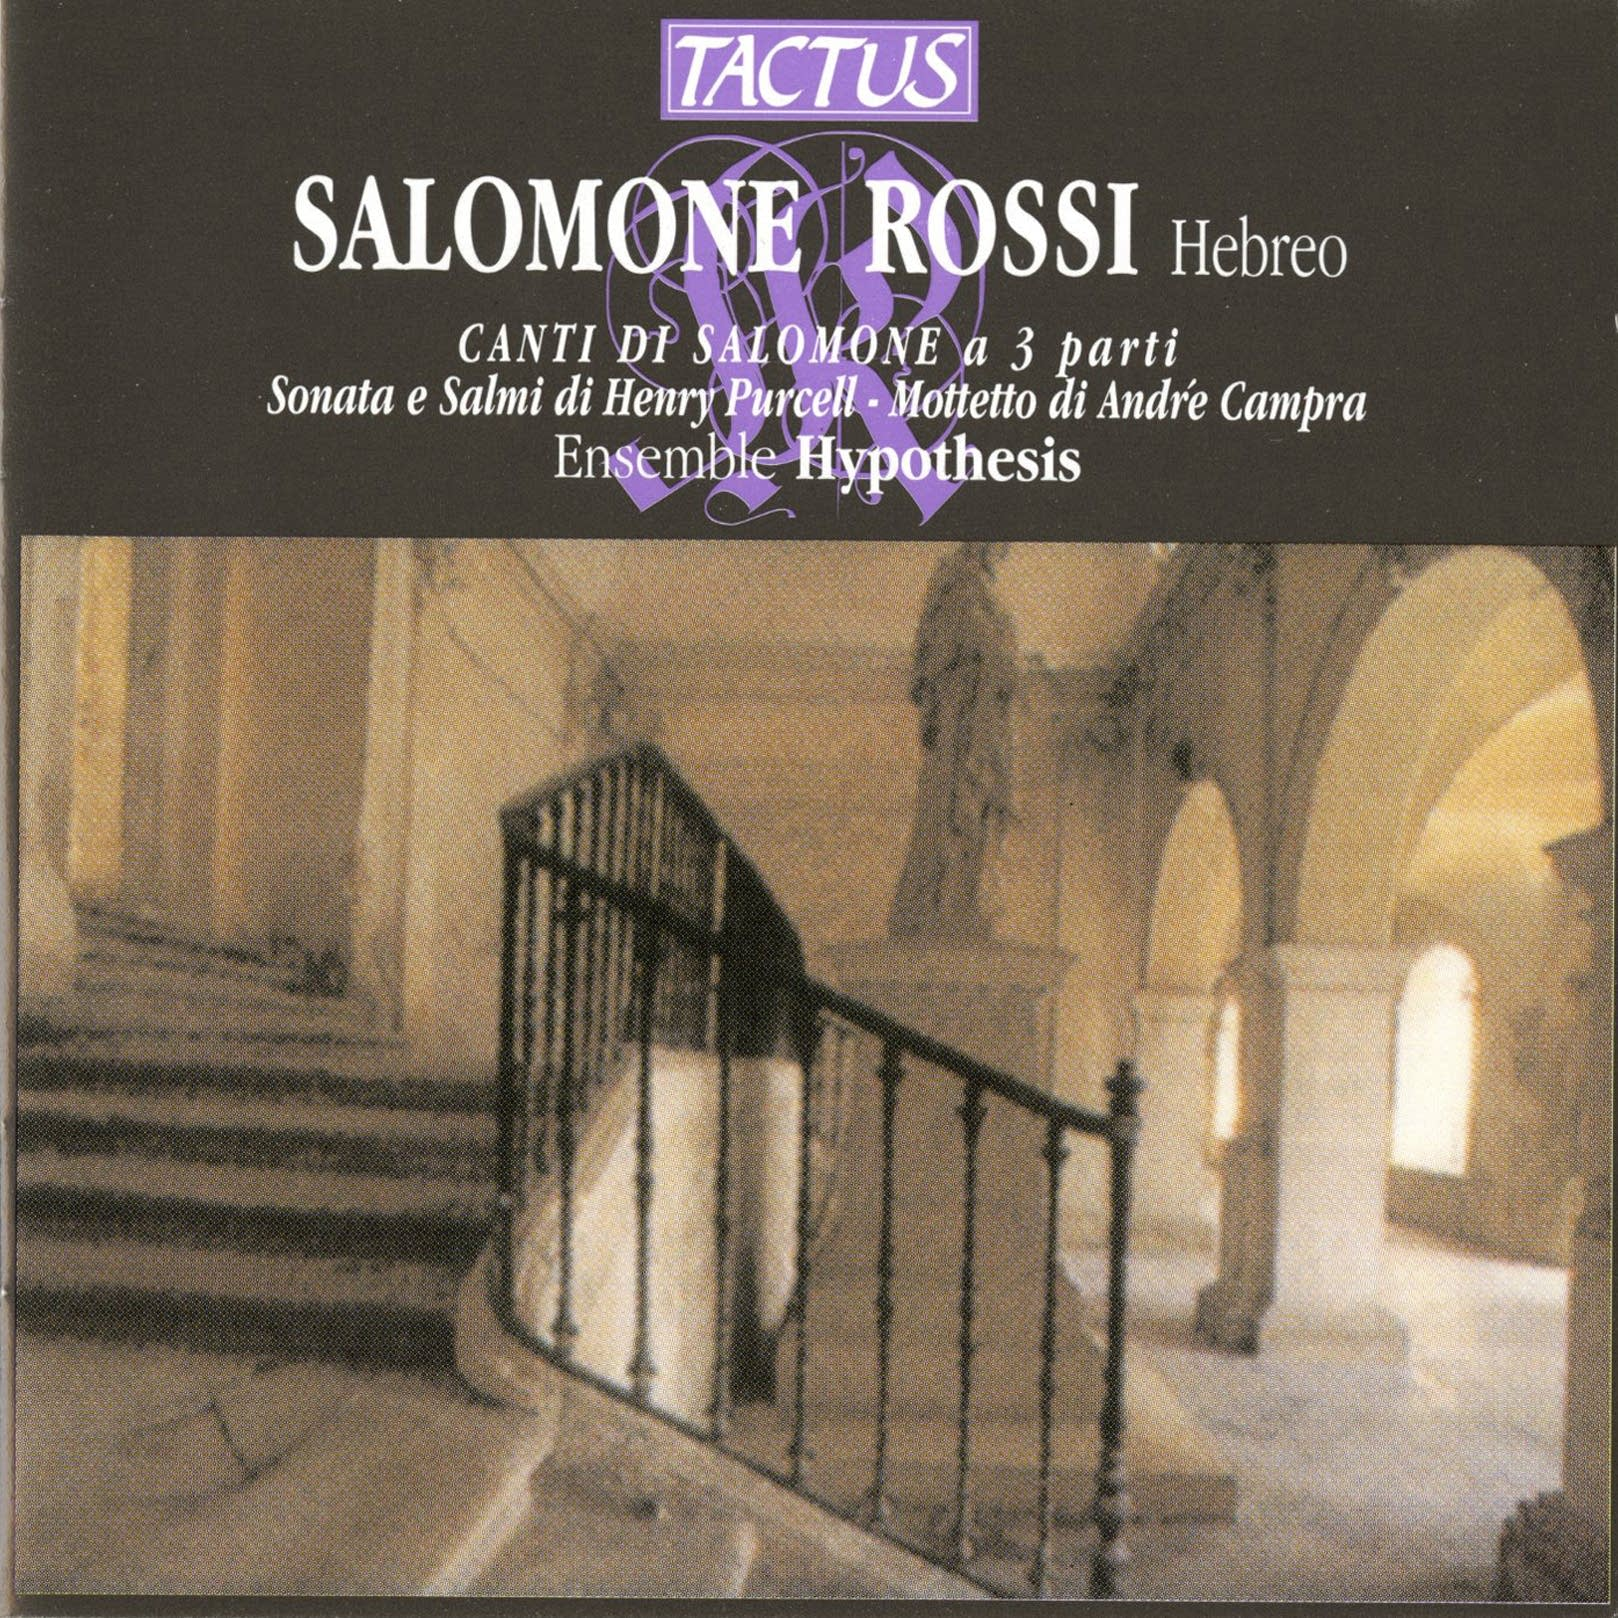 Salamone Rossi - Sinfonia Prima - Bar'chu